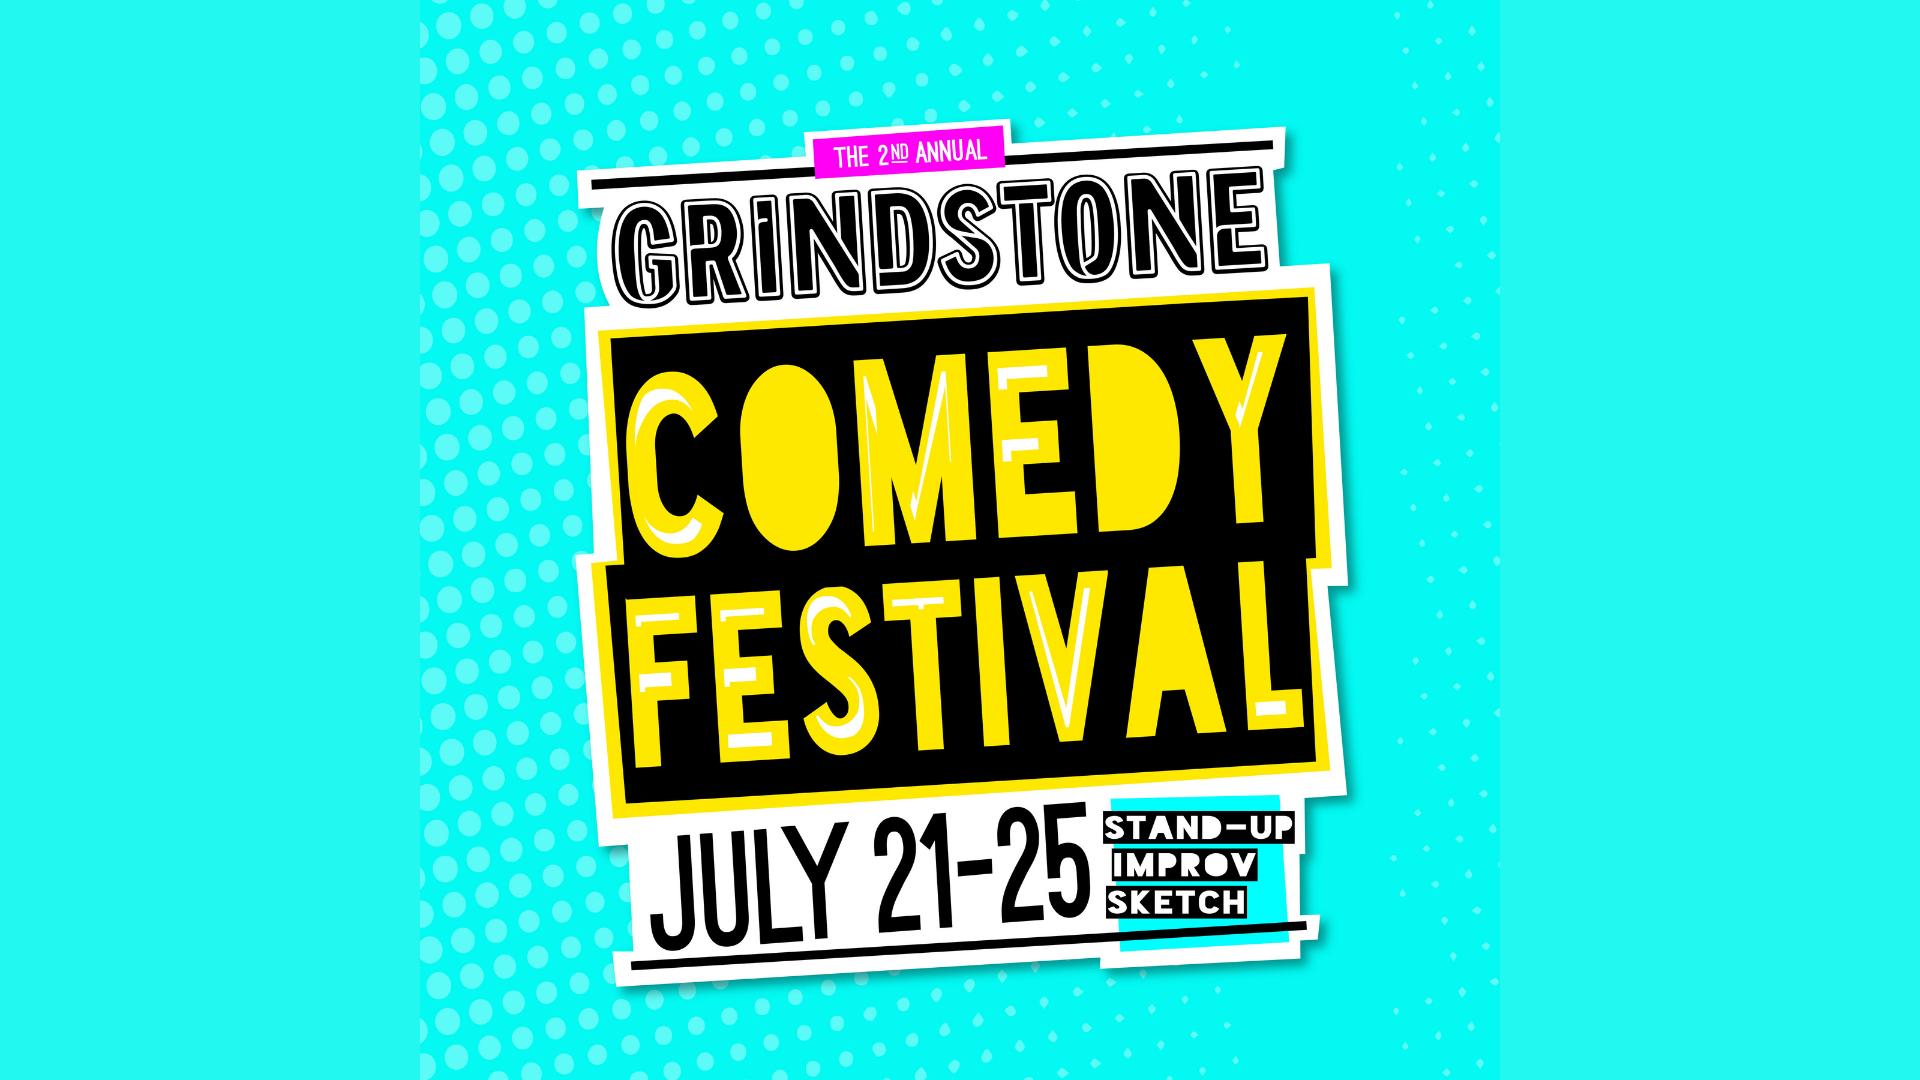 Event logo reads: Grindstone Comedy Festival July 21-25 on light blue background